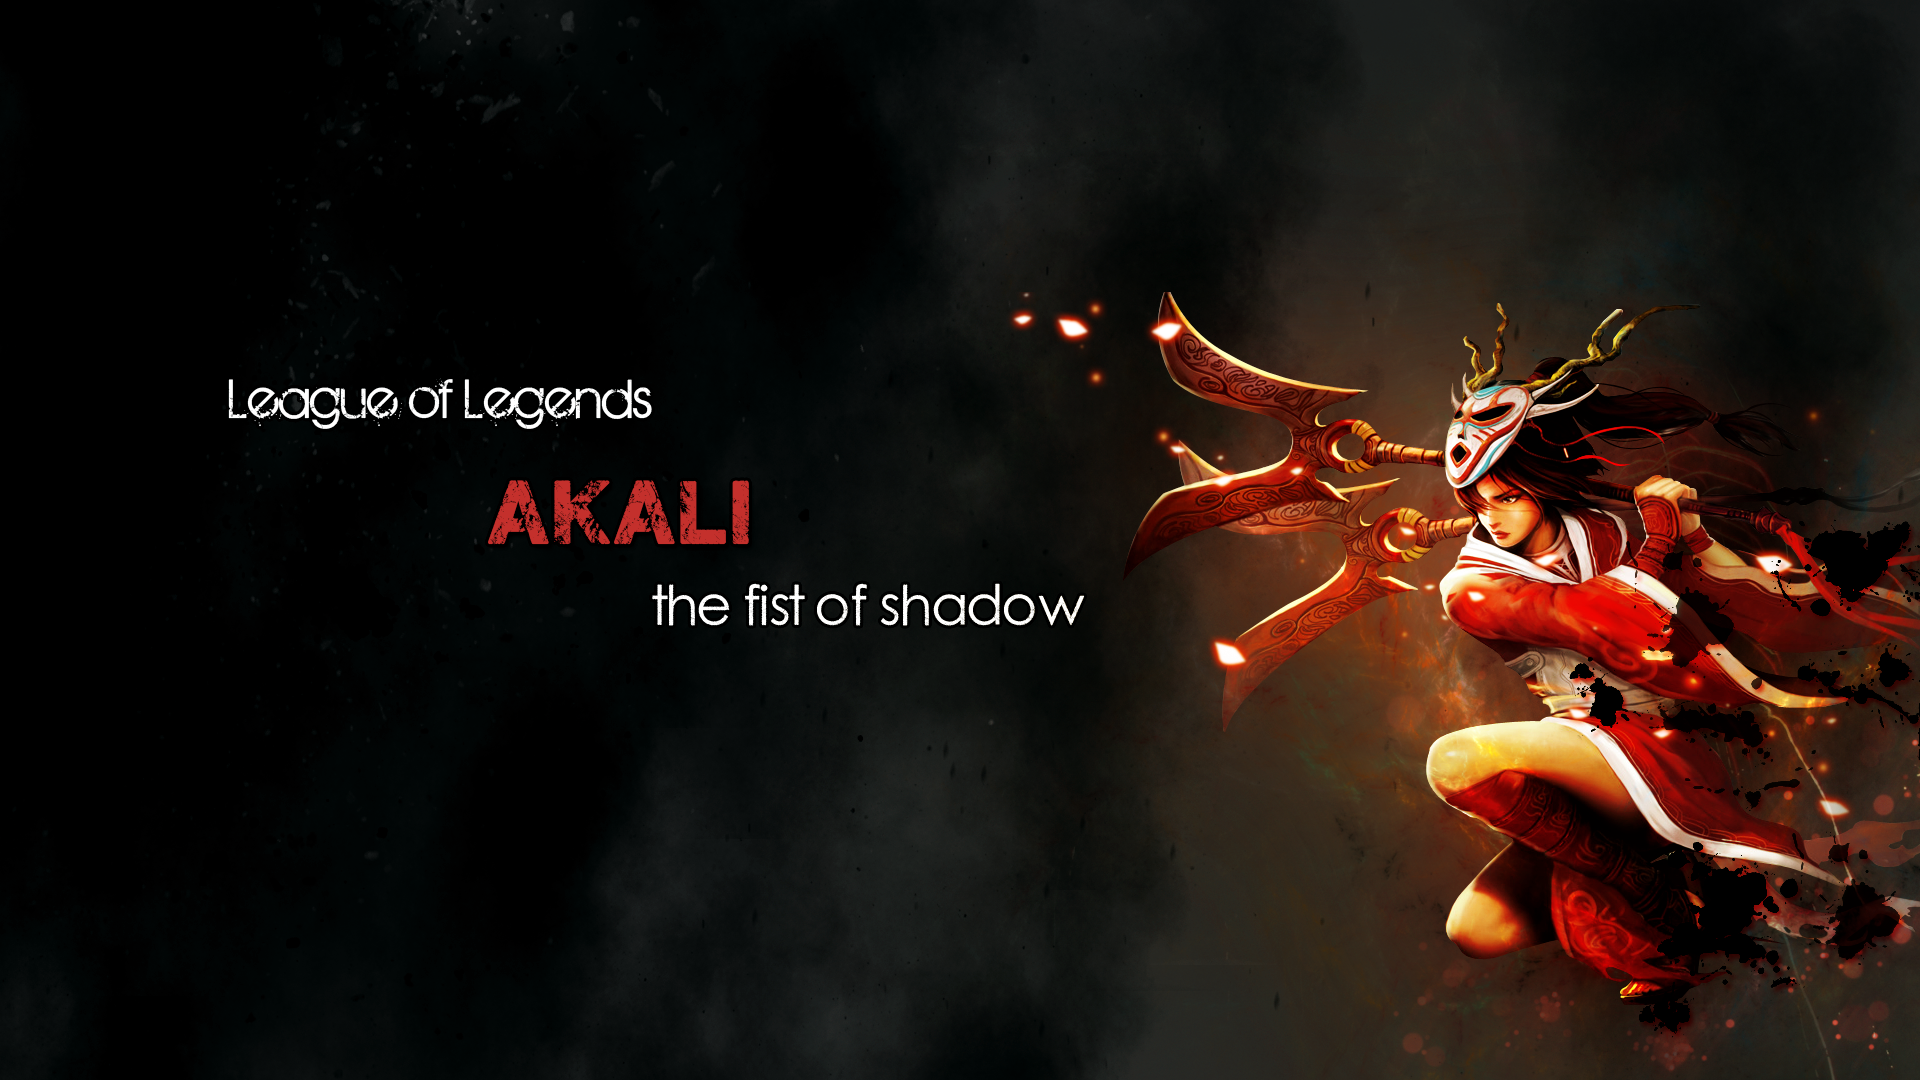 Woman Artistic Akali League Of Legends 1920x1080